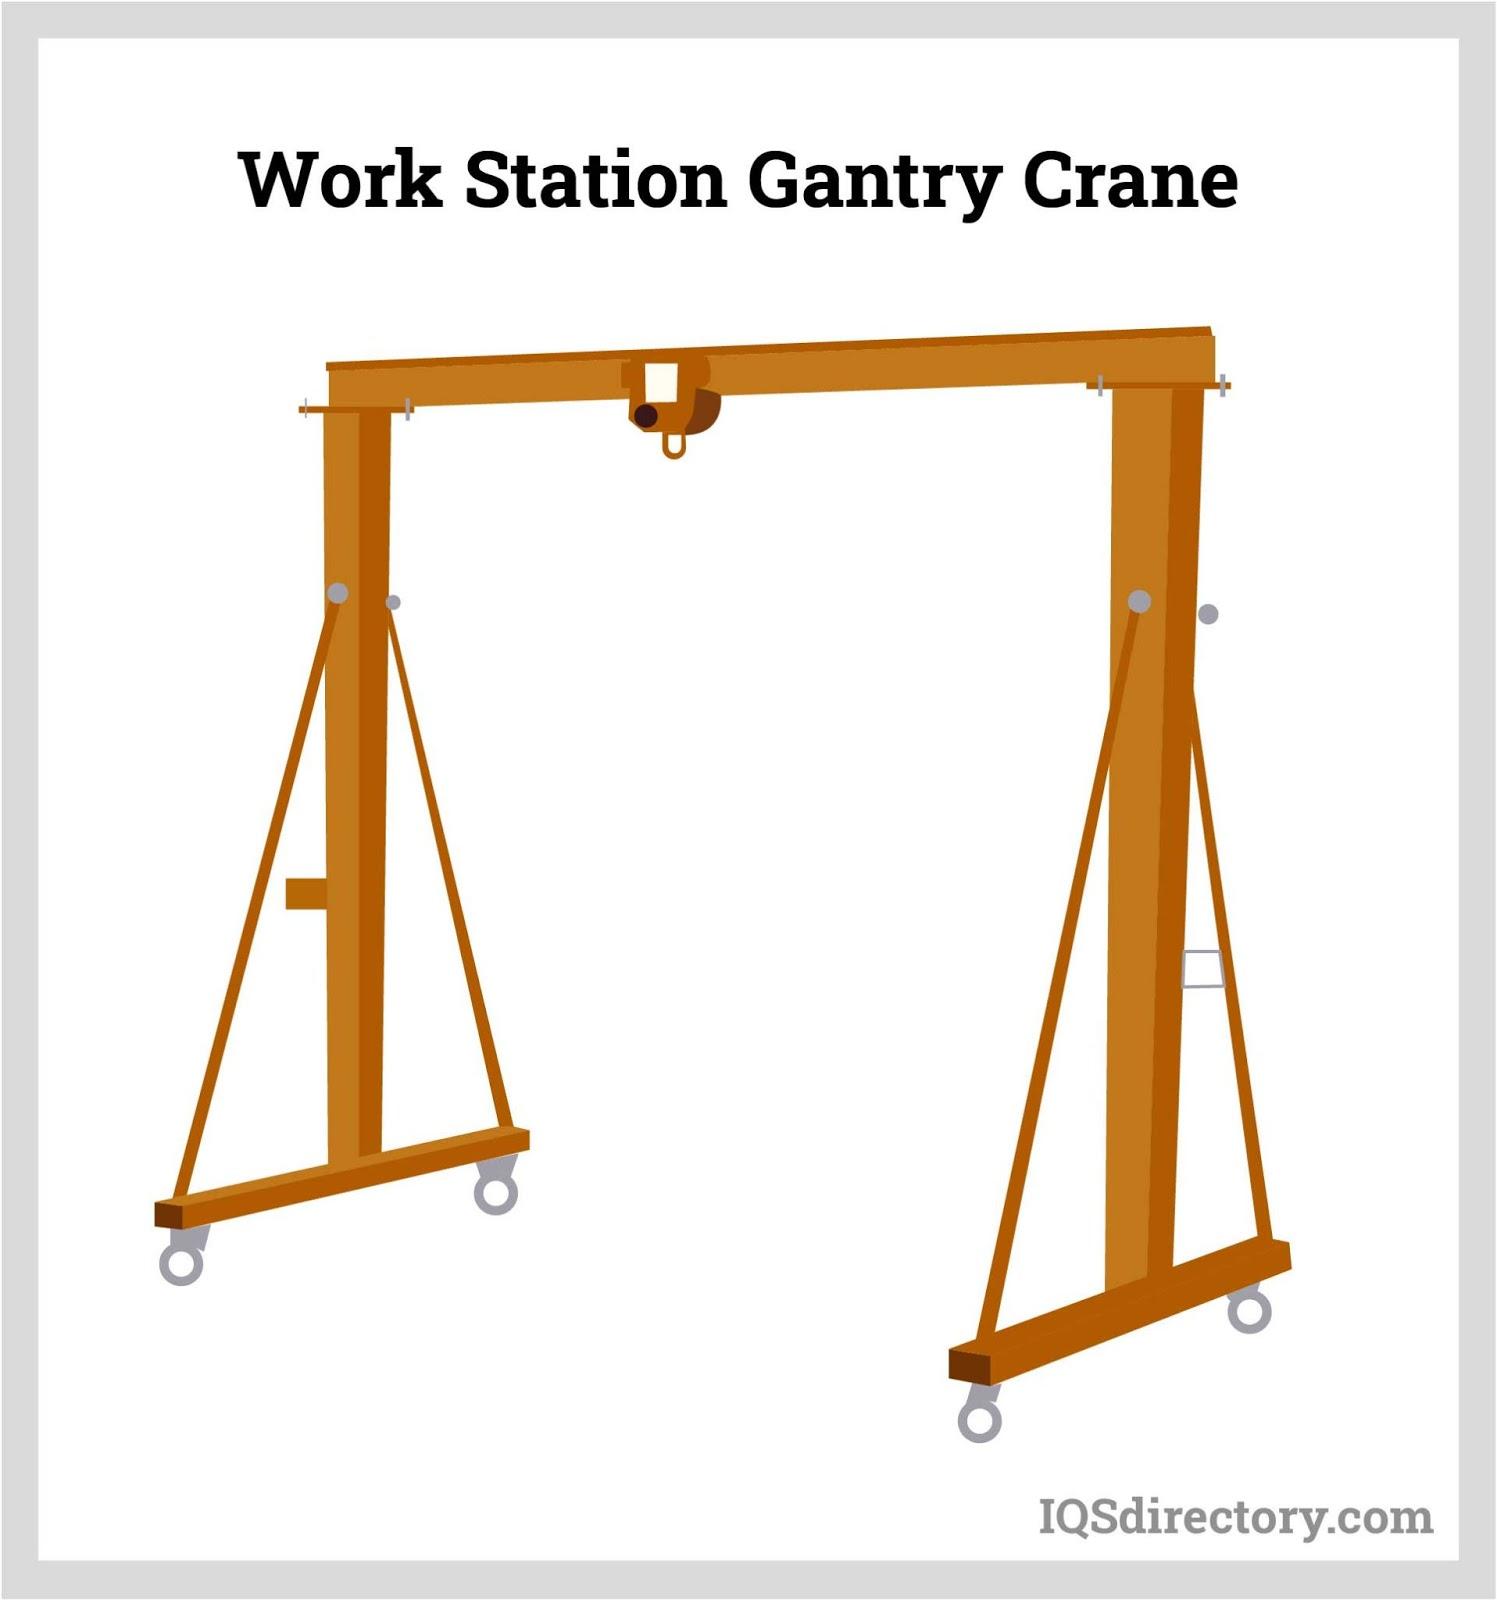 Work Station Gantry Crane